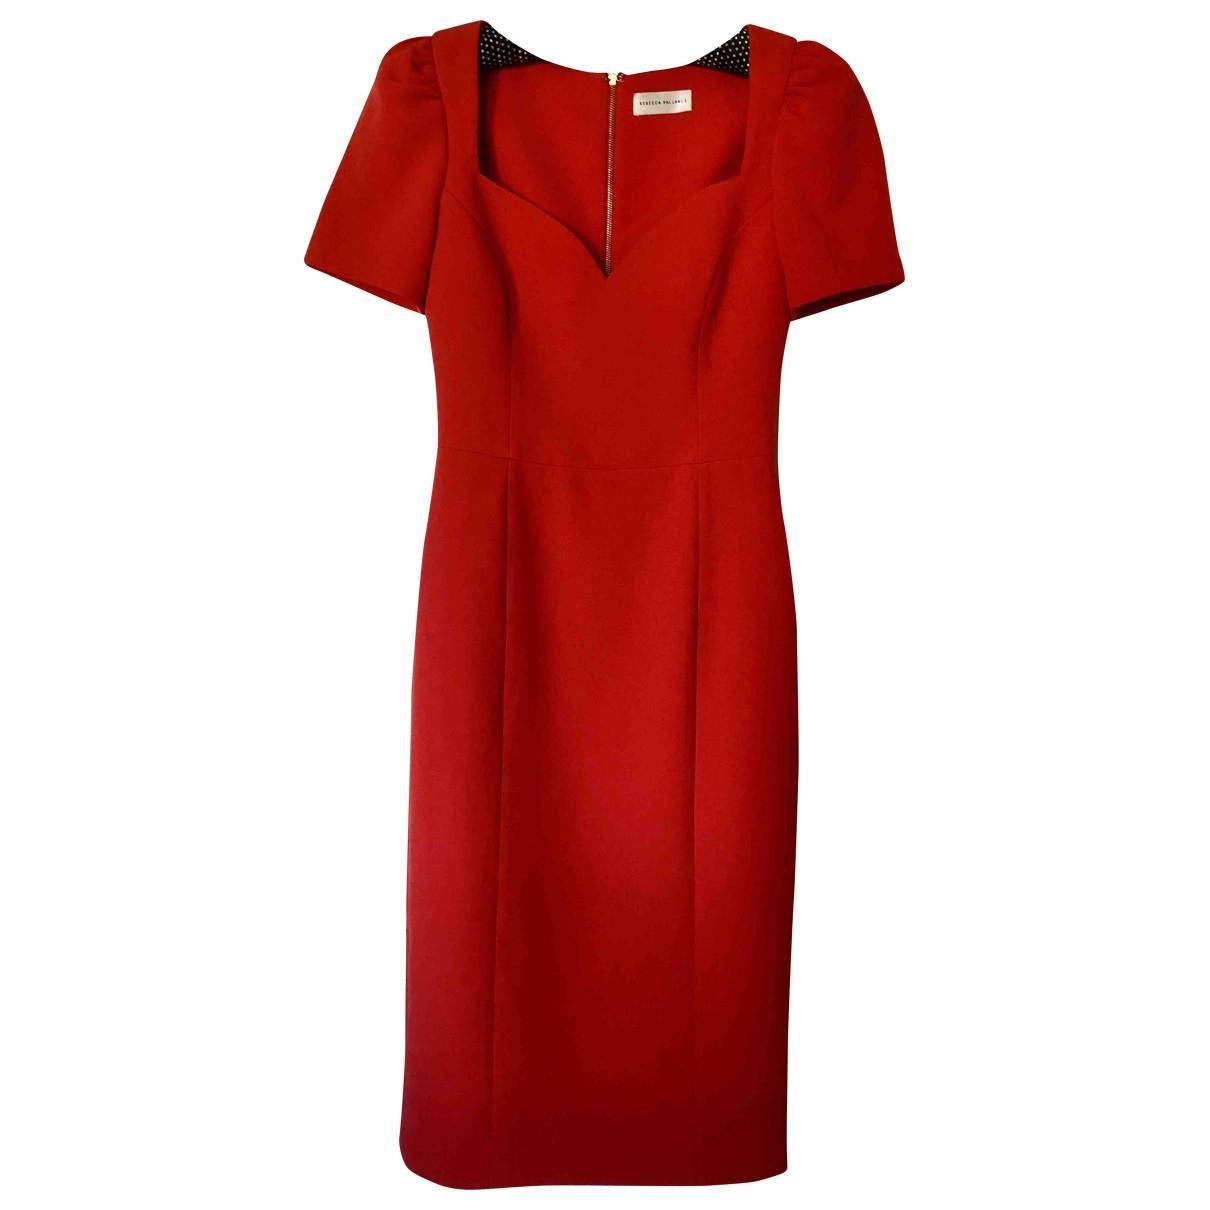 Rebecca Vallance \N Red dress for Women S International